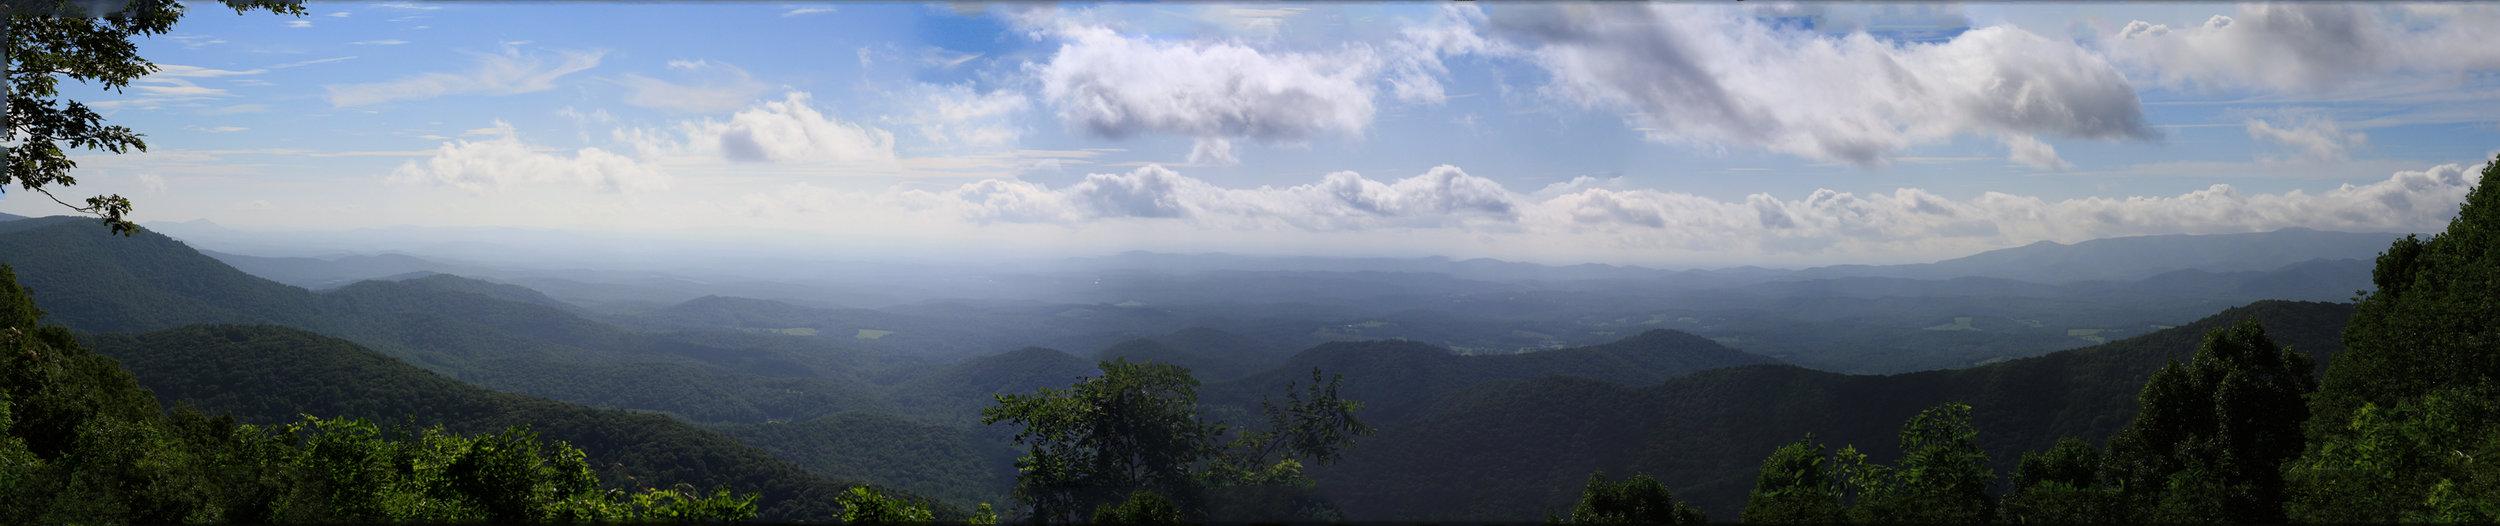 Blue Ridge Mountains, Roanoke, VA, August 2016